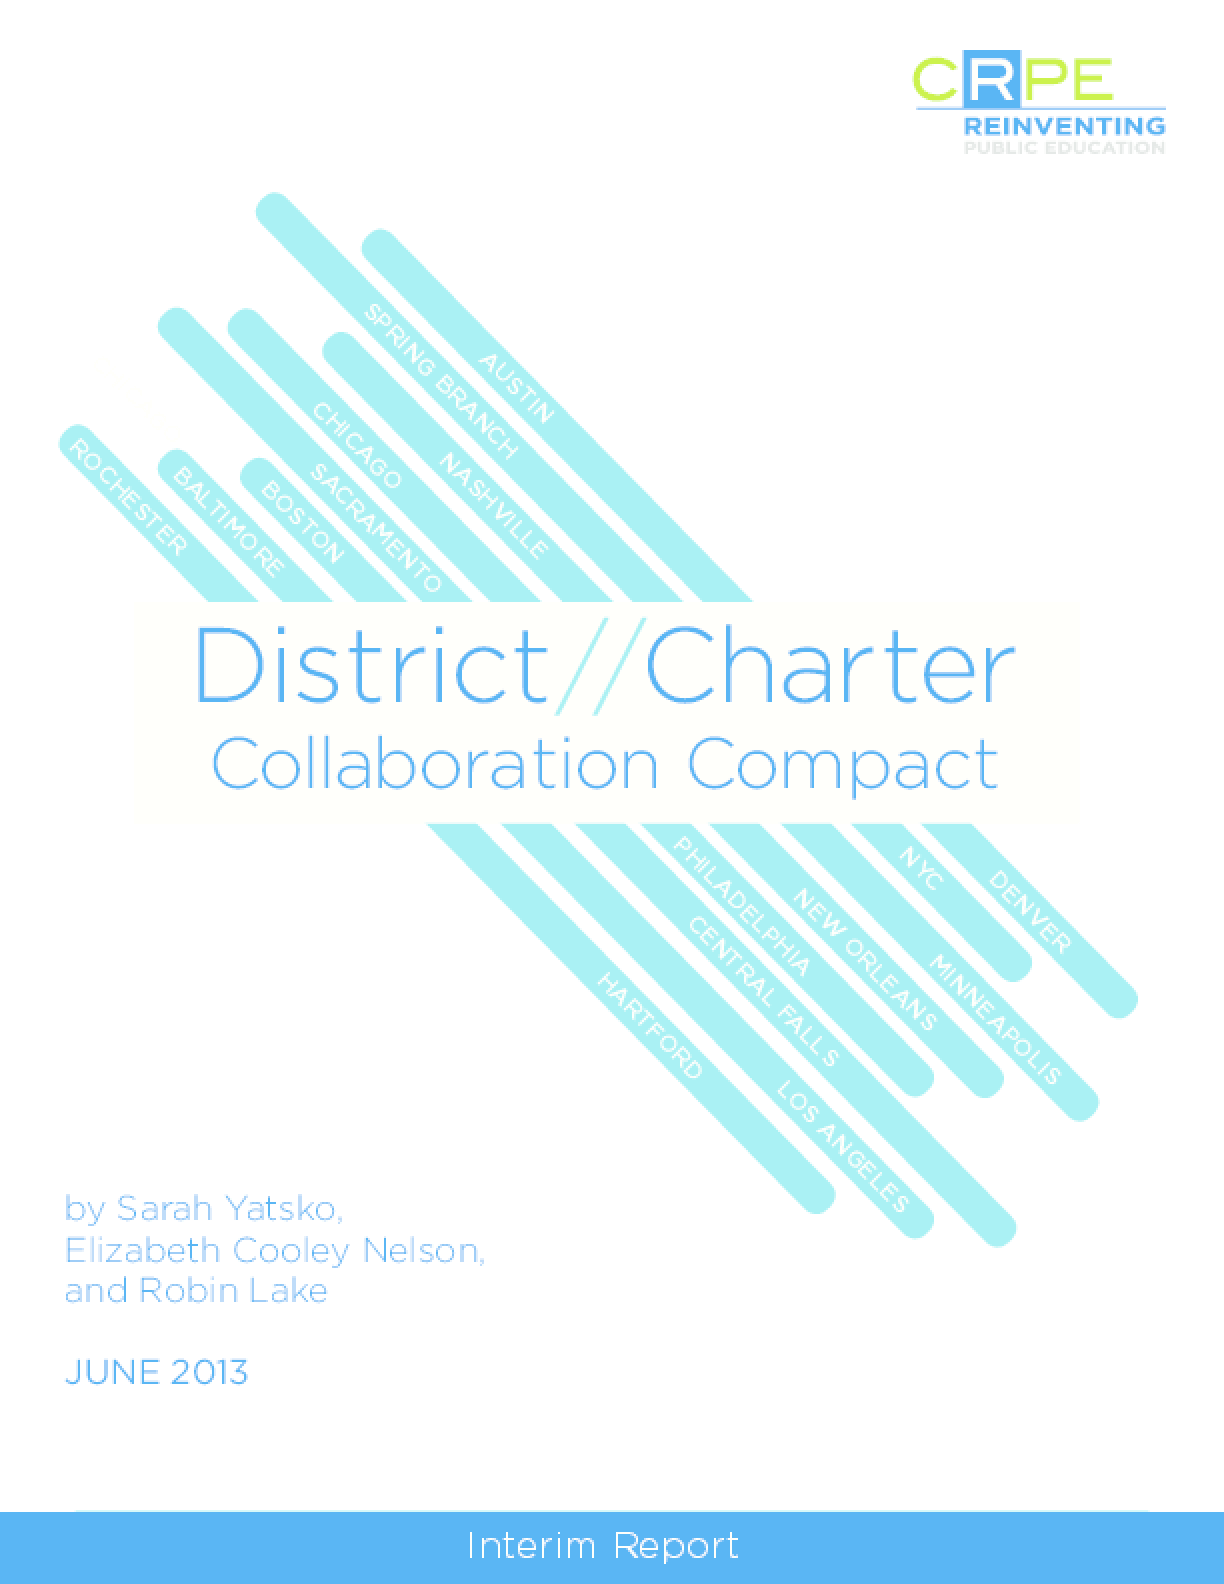 District-Charter Collaboration Compact: Interim Report